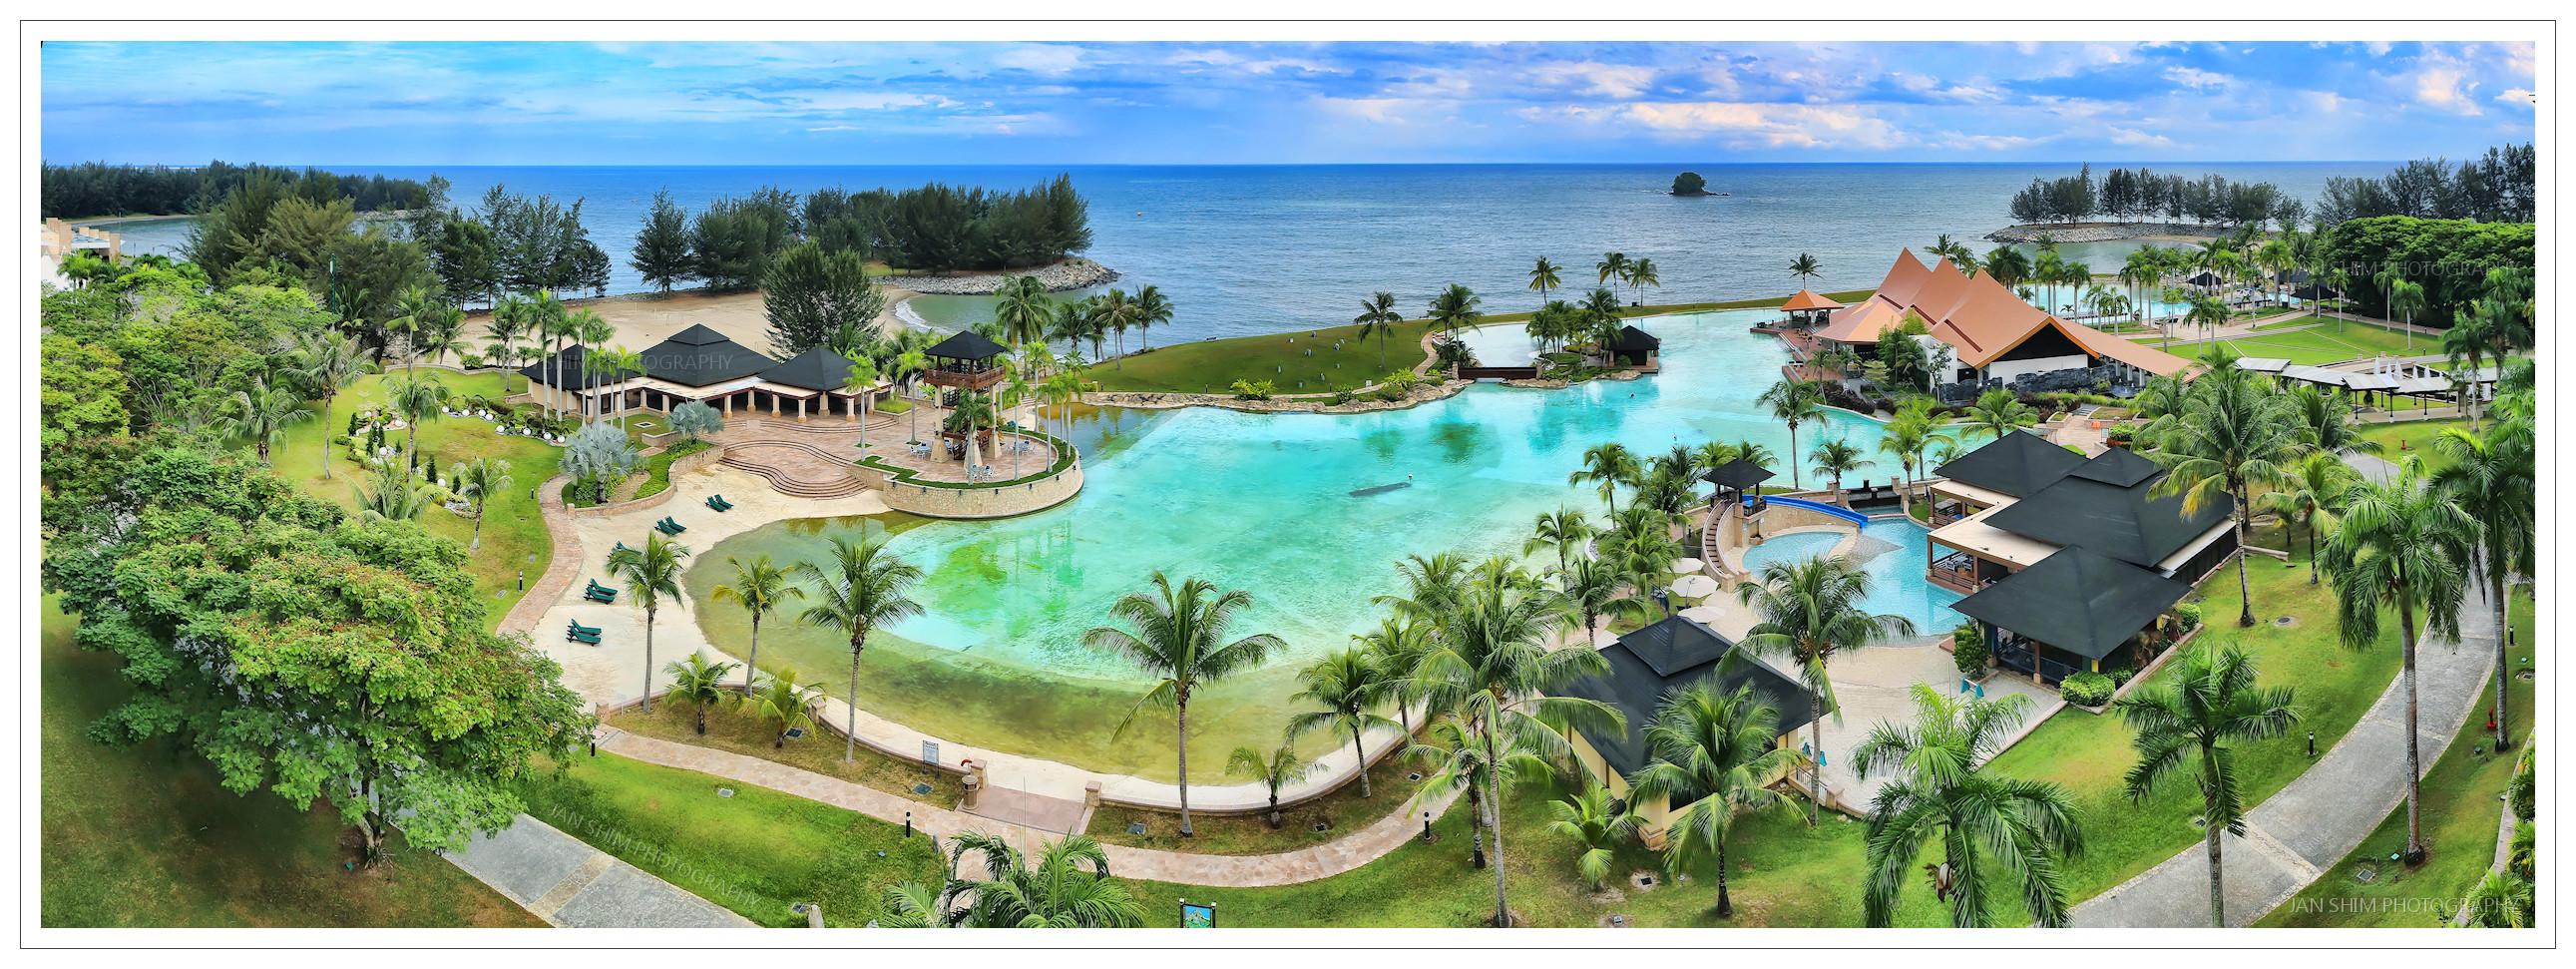 The empire hotel country club beachfront panorama - Centrepoint hotel brunei swimming pool ...